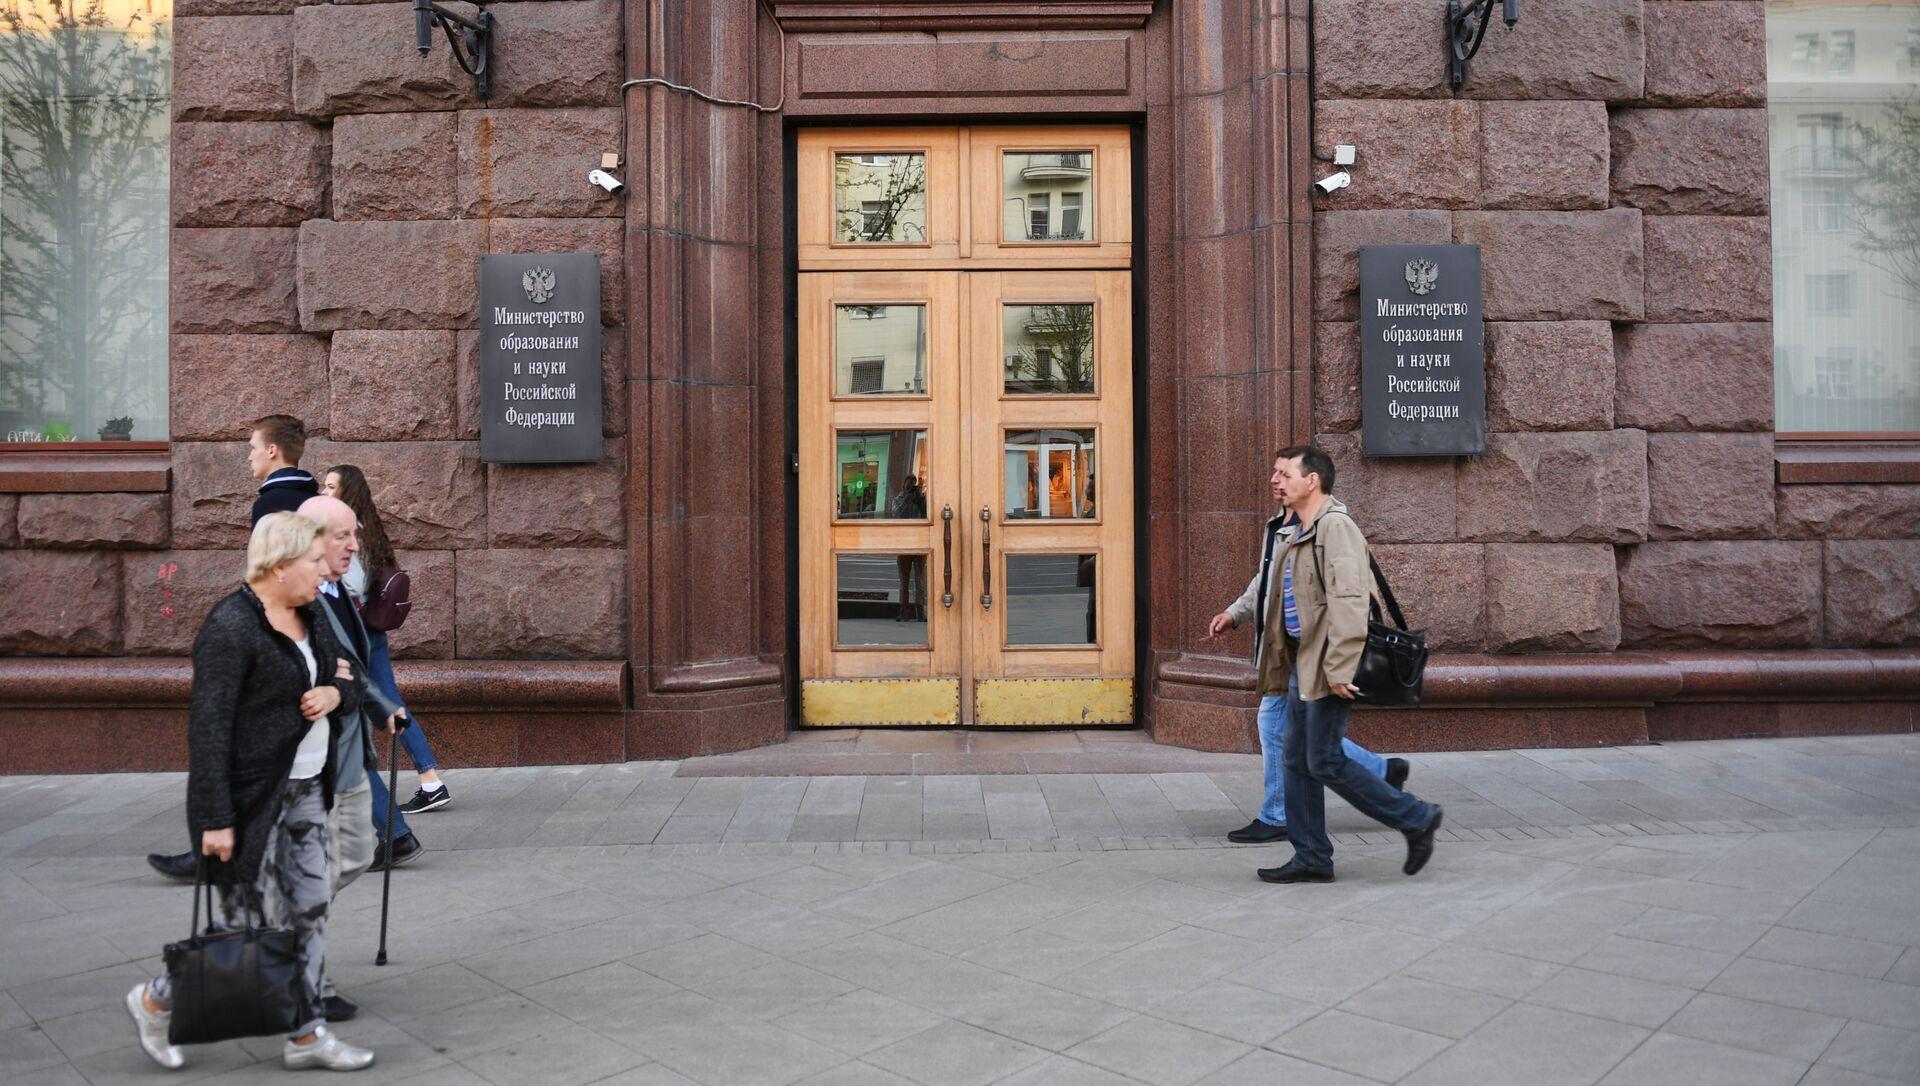 Вход в здание министерства образования и науки РФ. - Sputnik Азербайджан, 1920, 14.04.2021